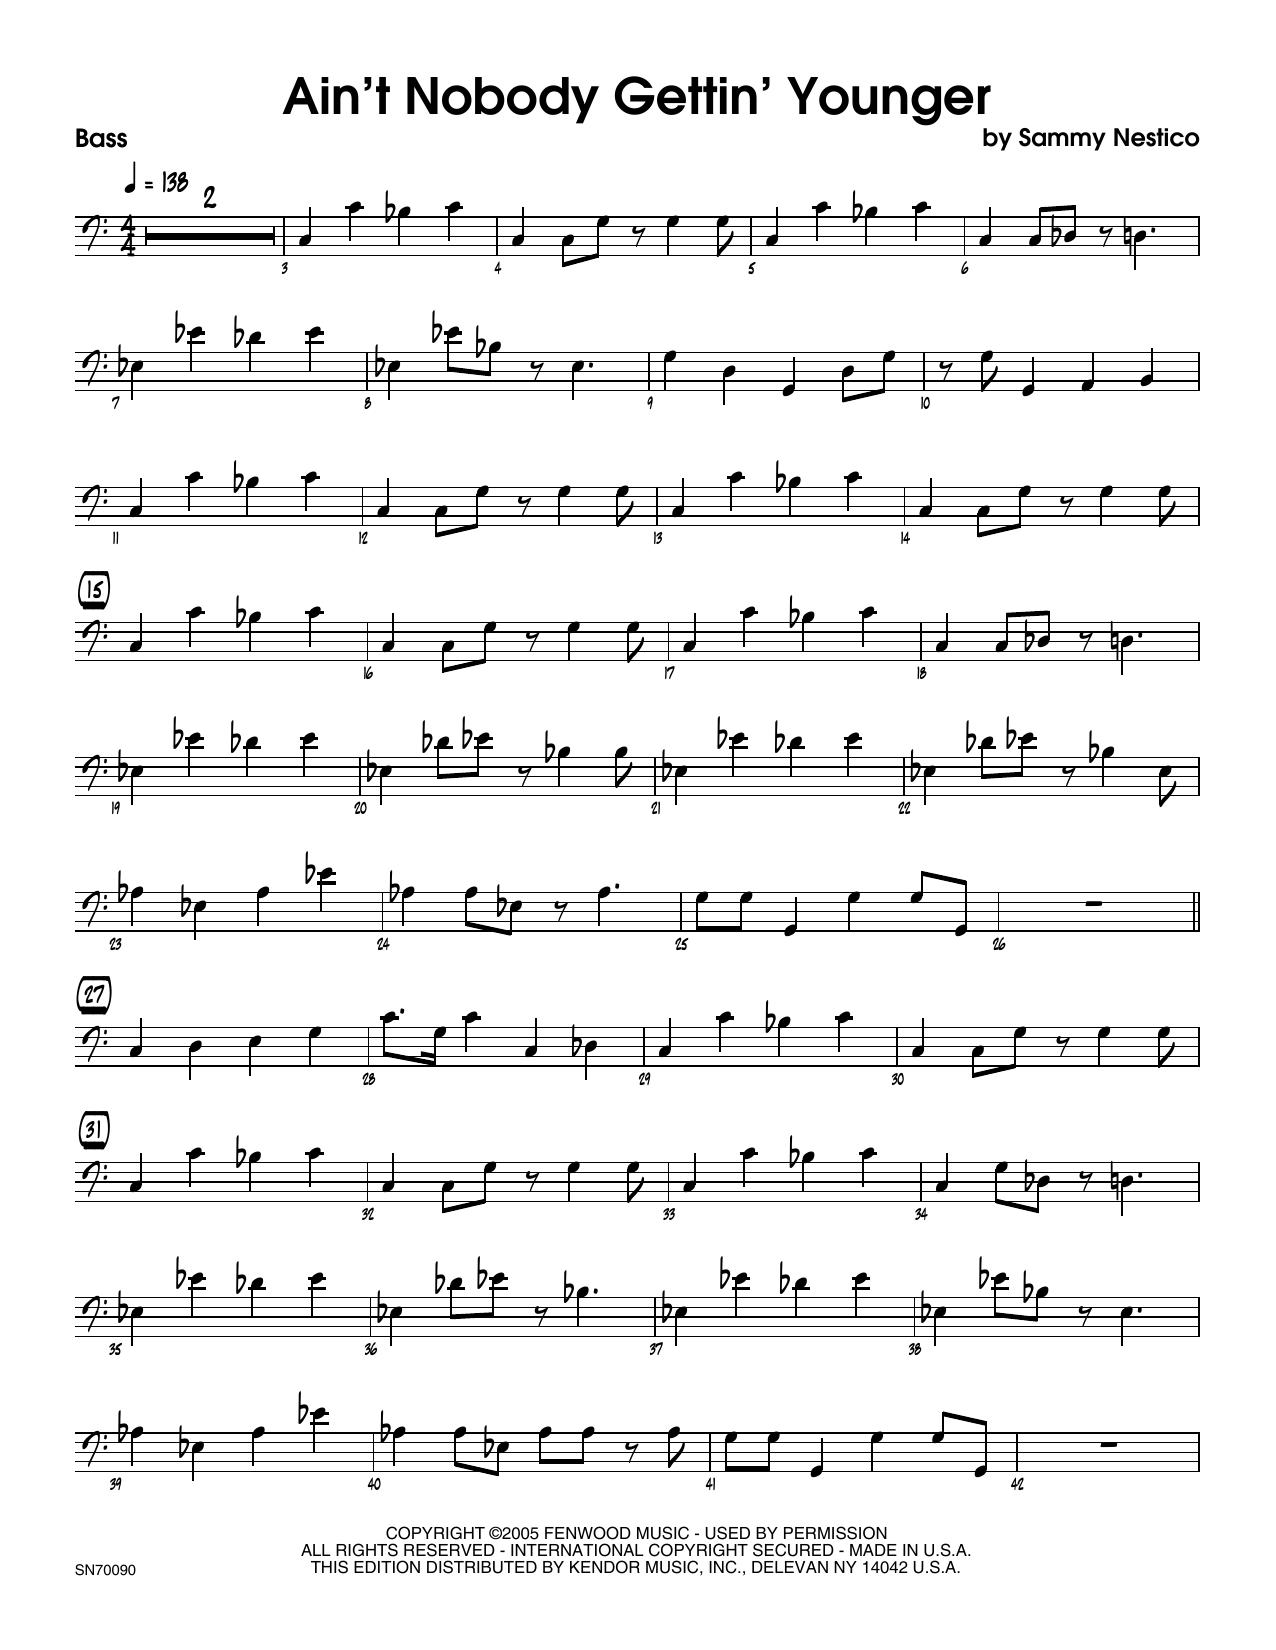 Ain't Nobody Gettin' Younger - Bass Sheet Music